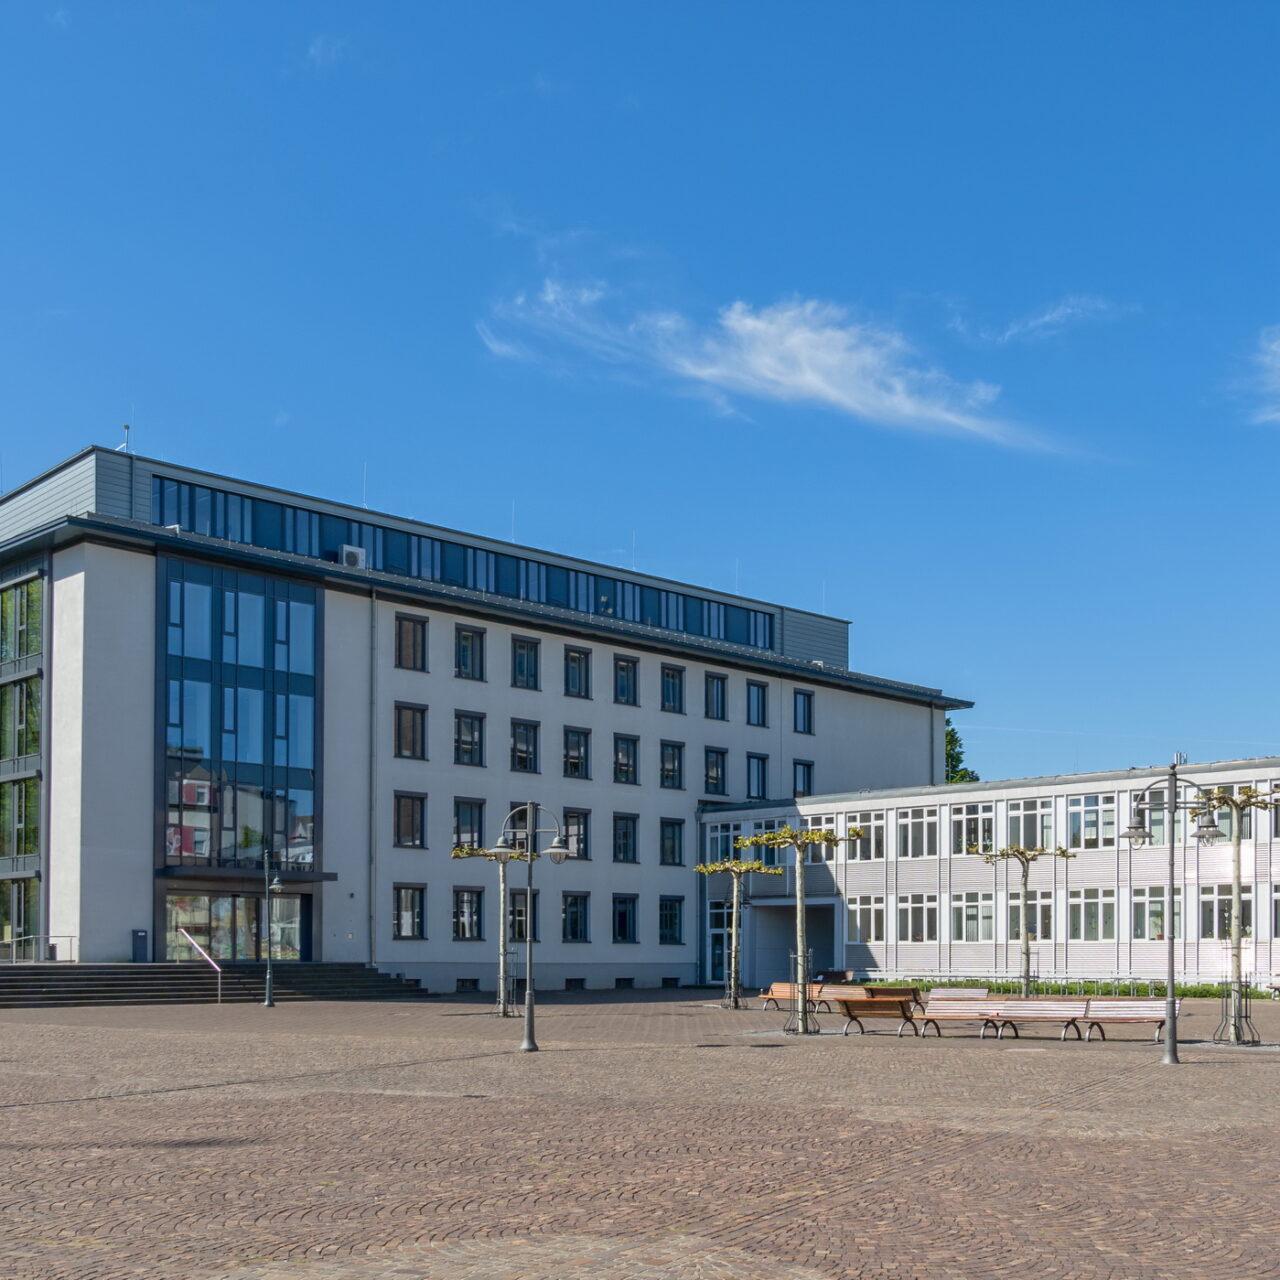 publity stößt Gewerbeimmobilie in NRWab